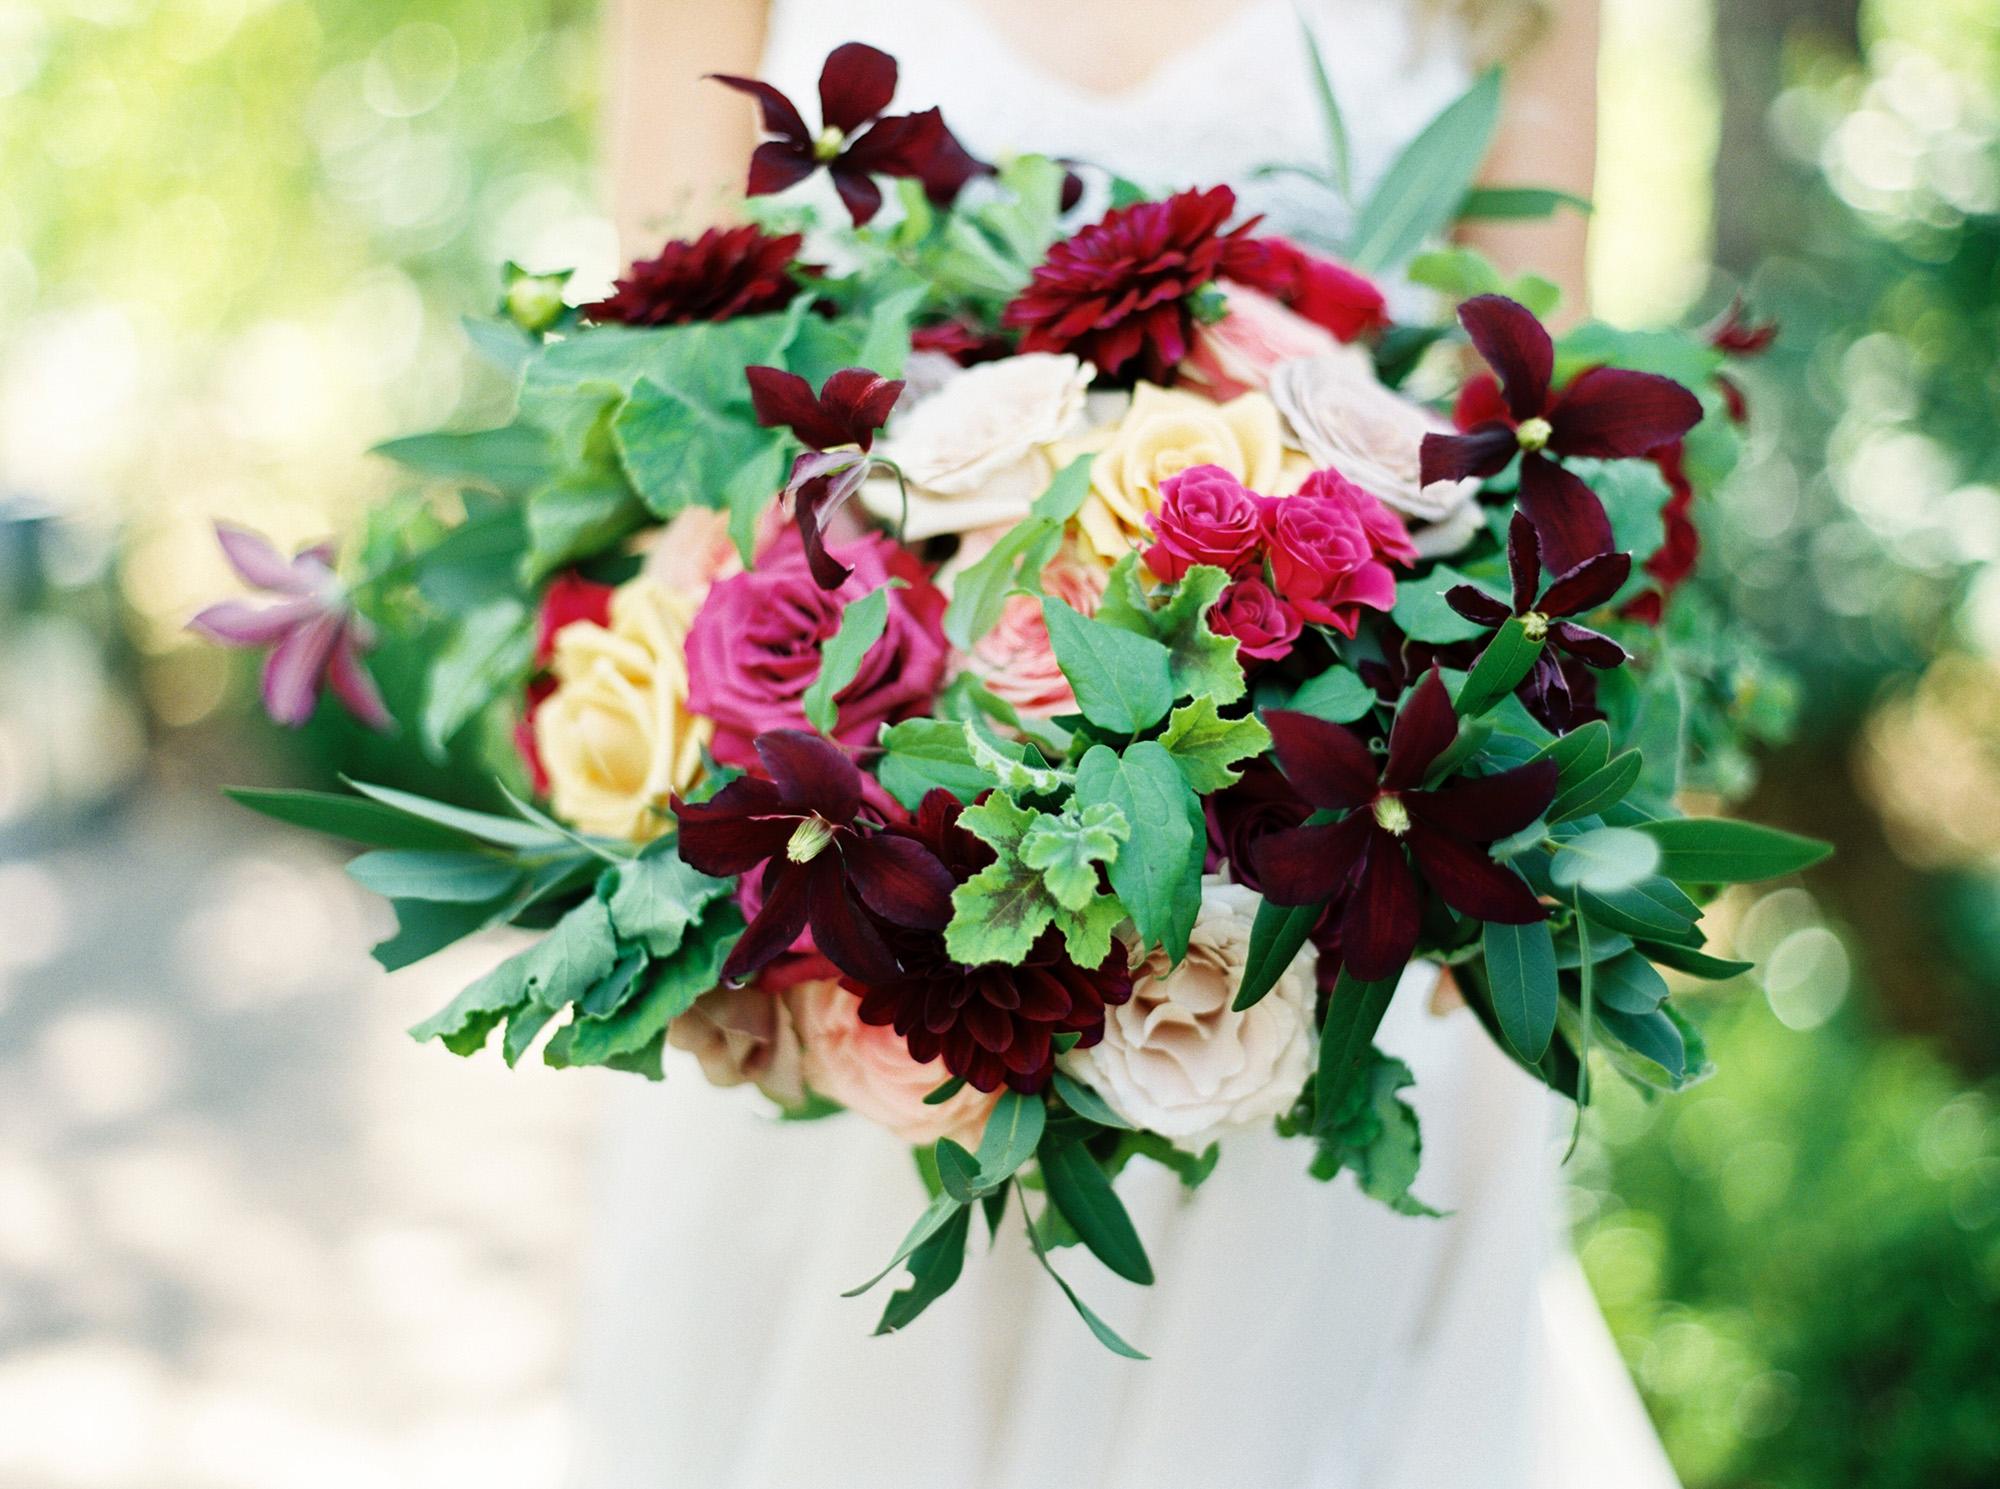 The flower studio arizona welcome1g izmirmasajfo